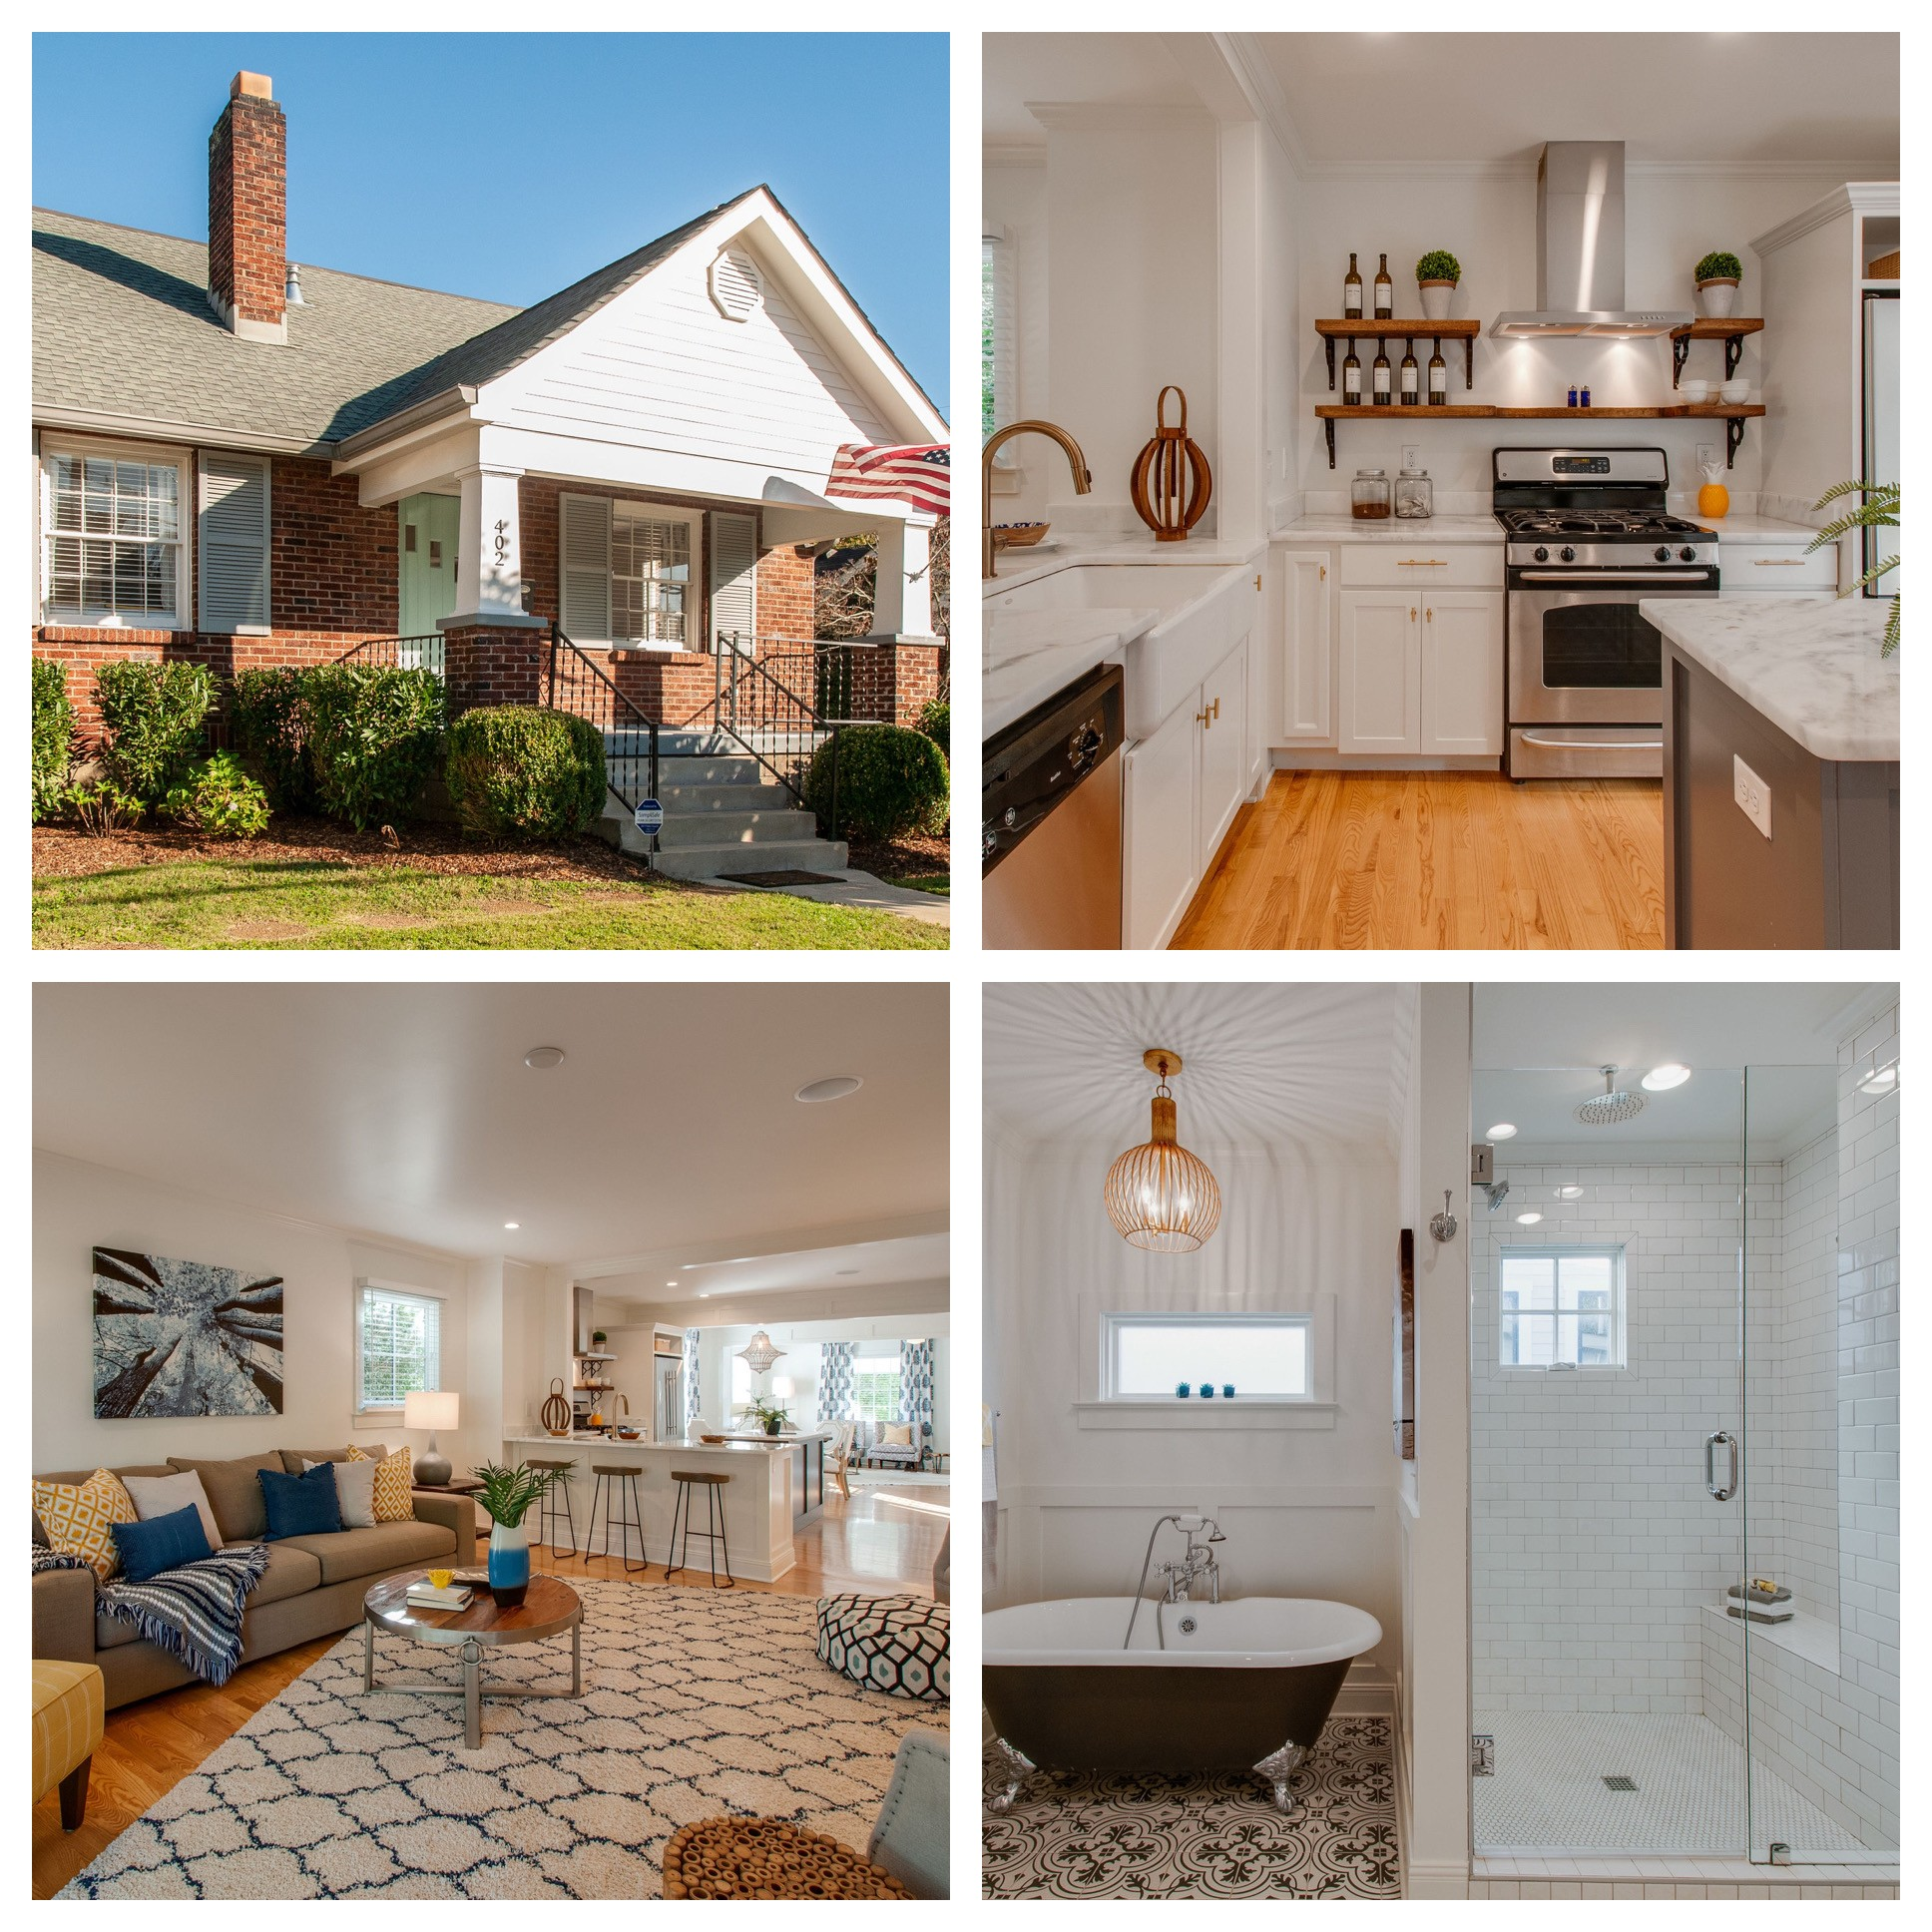 402 N 17th St, Nashville, TN 37206 - Nashville, TN real estate listing